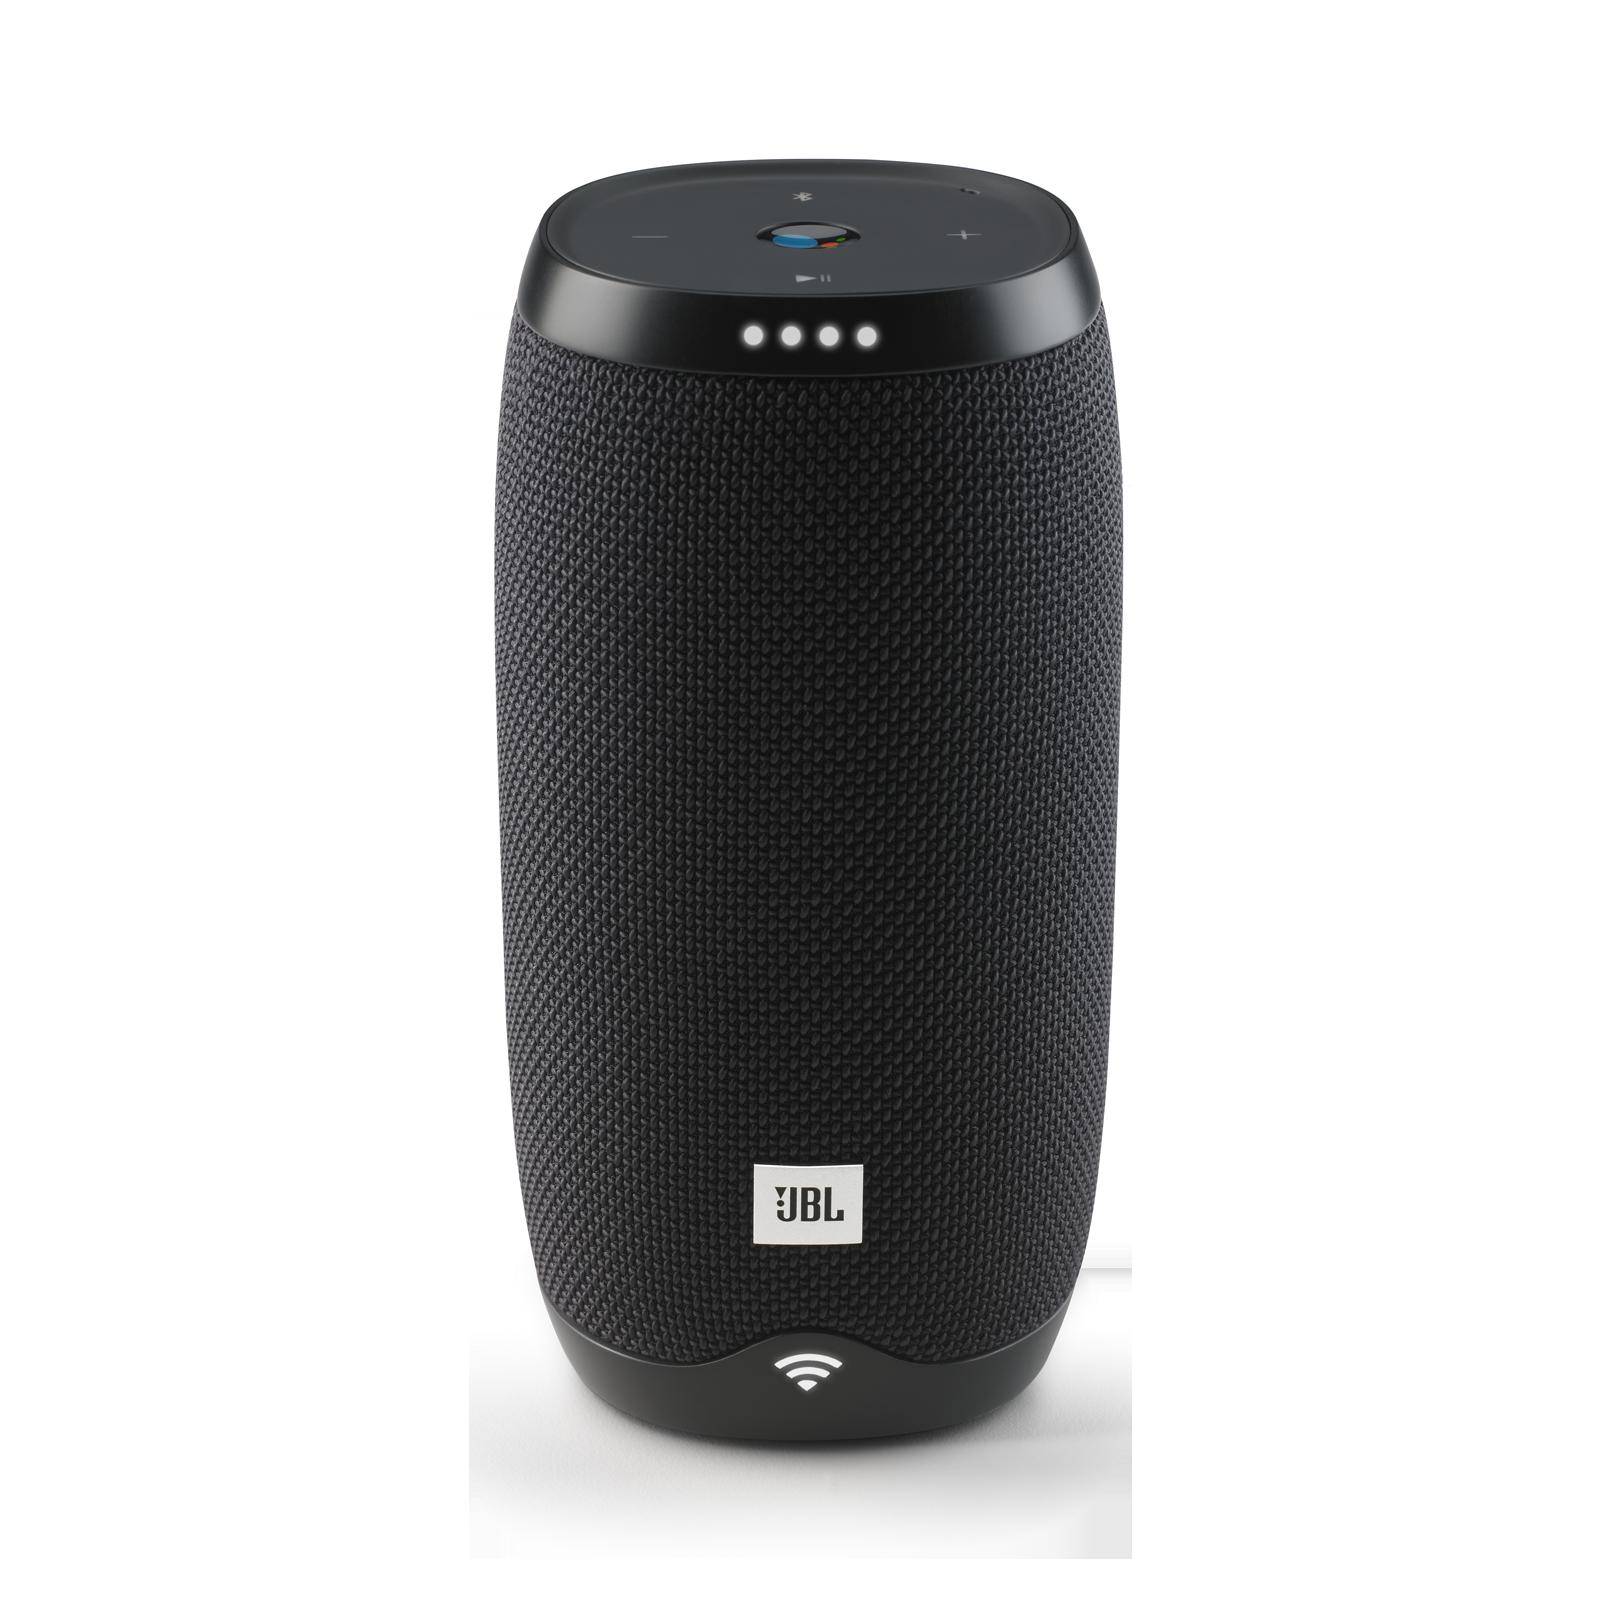 JBL Link 10 - Black - Voice-activated portable speaker - Front